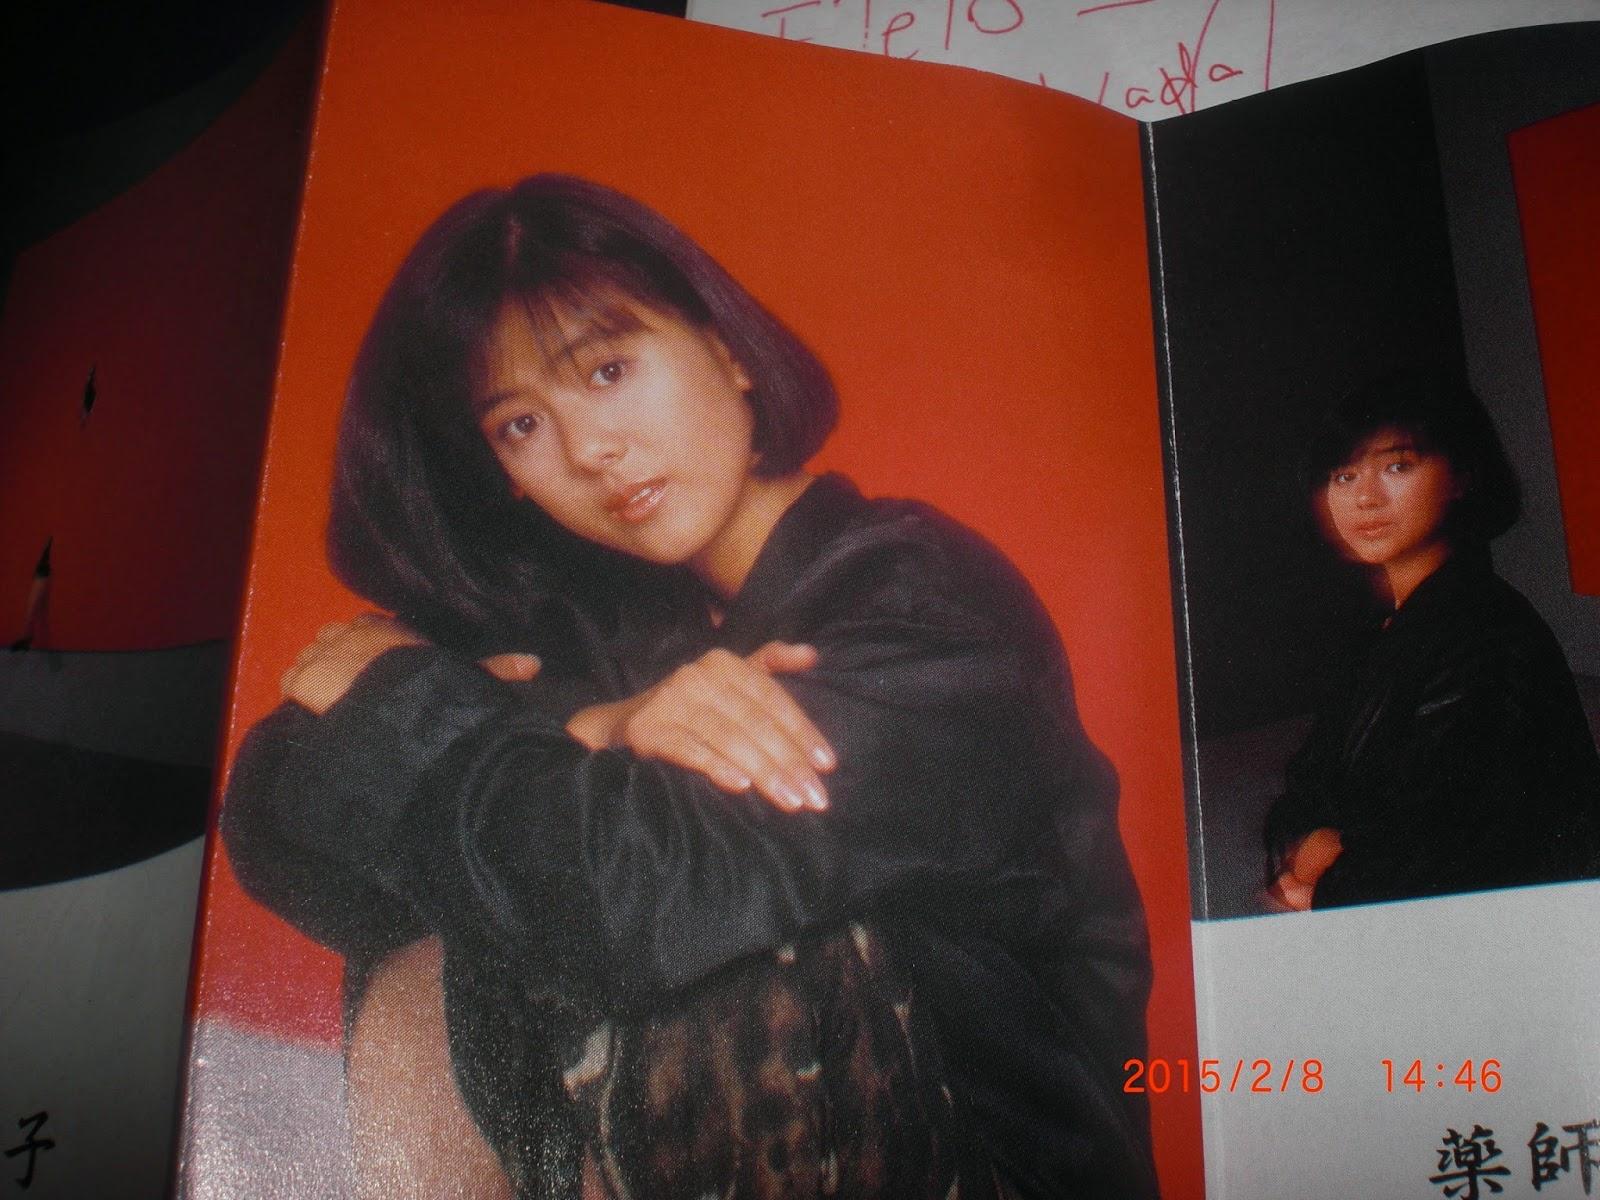 Kei Mizutani